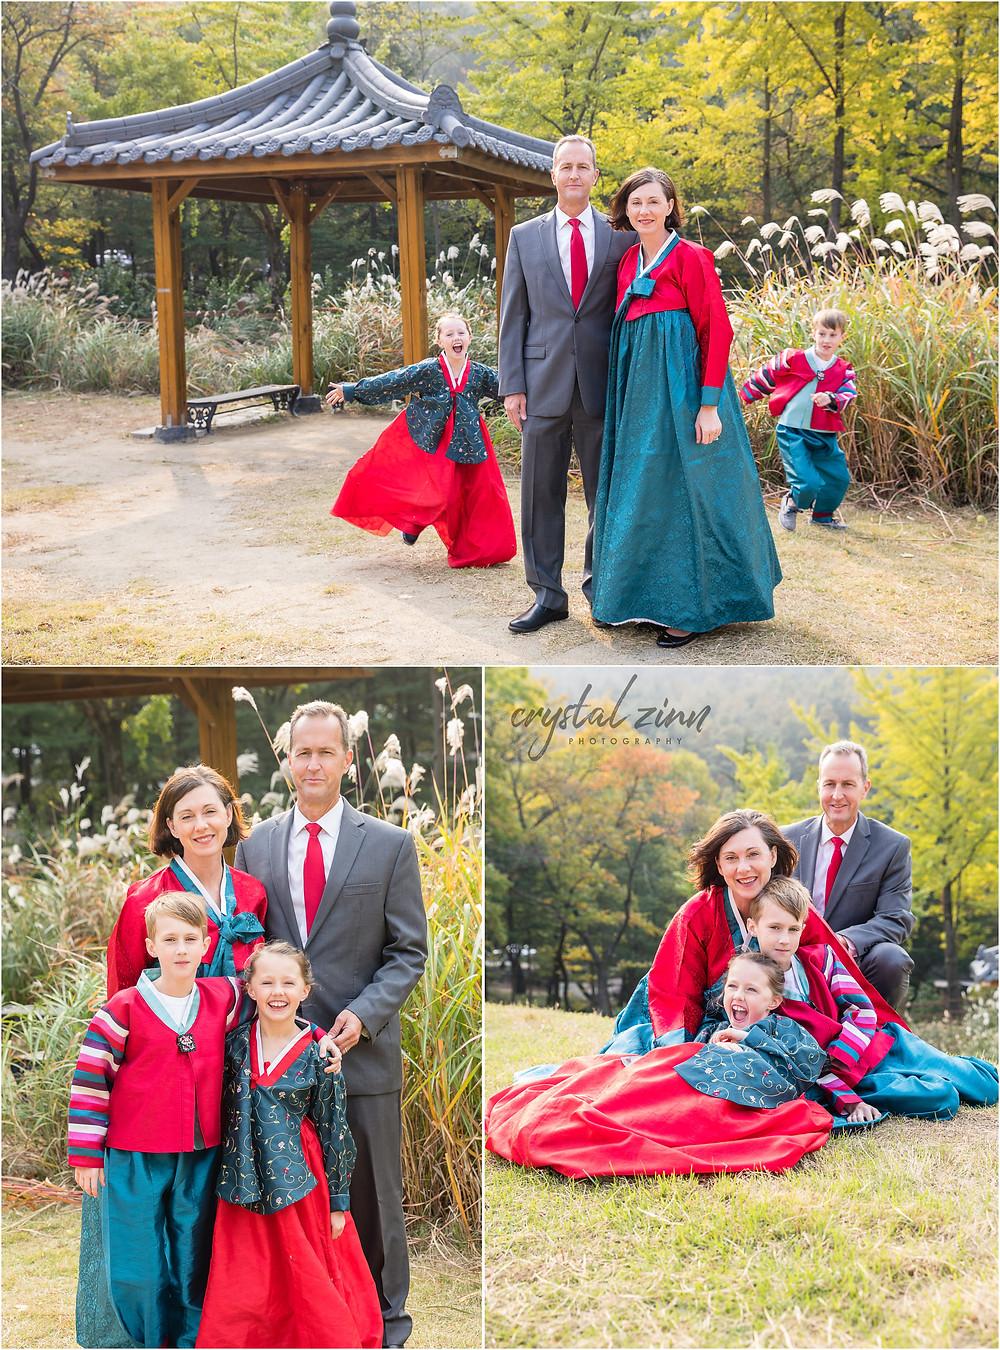 fun family portrait session in Daegu, South Korea in the autumn